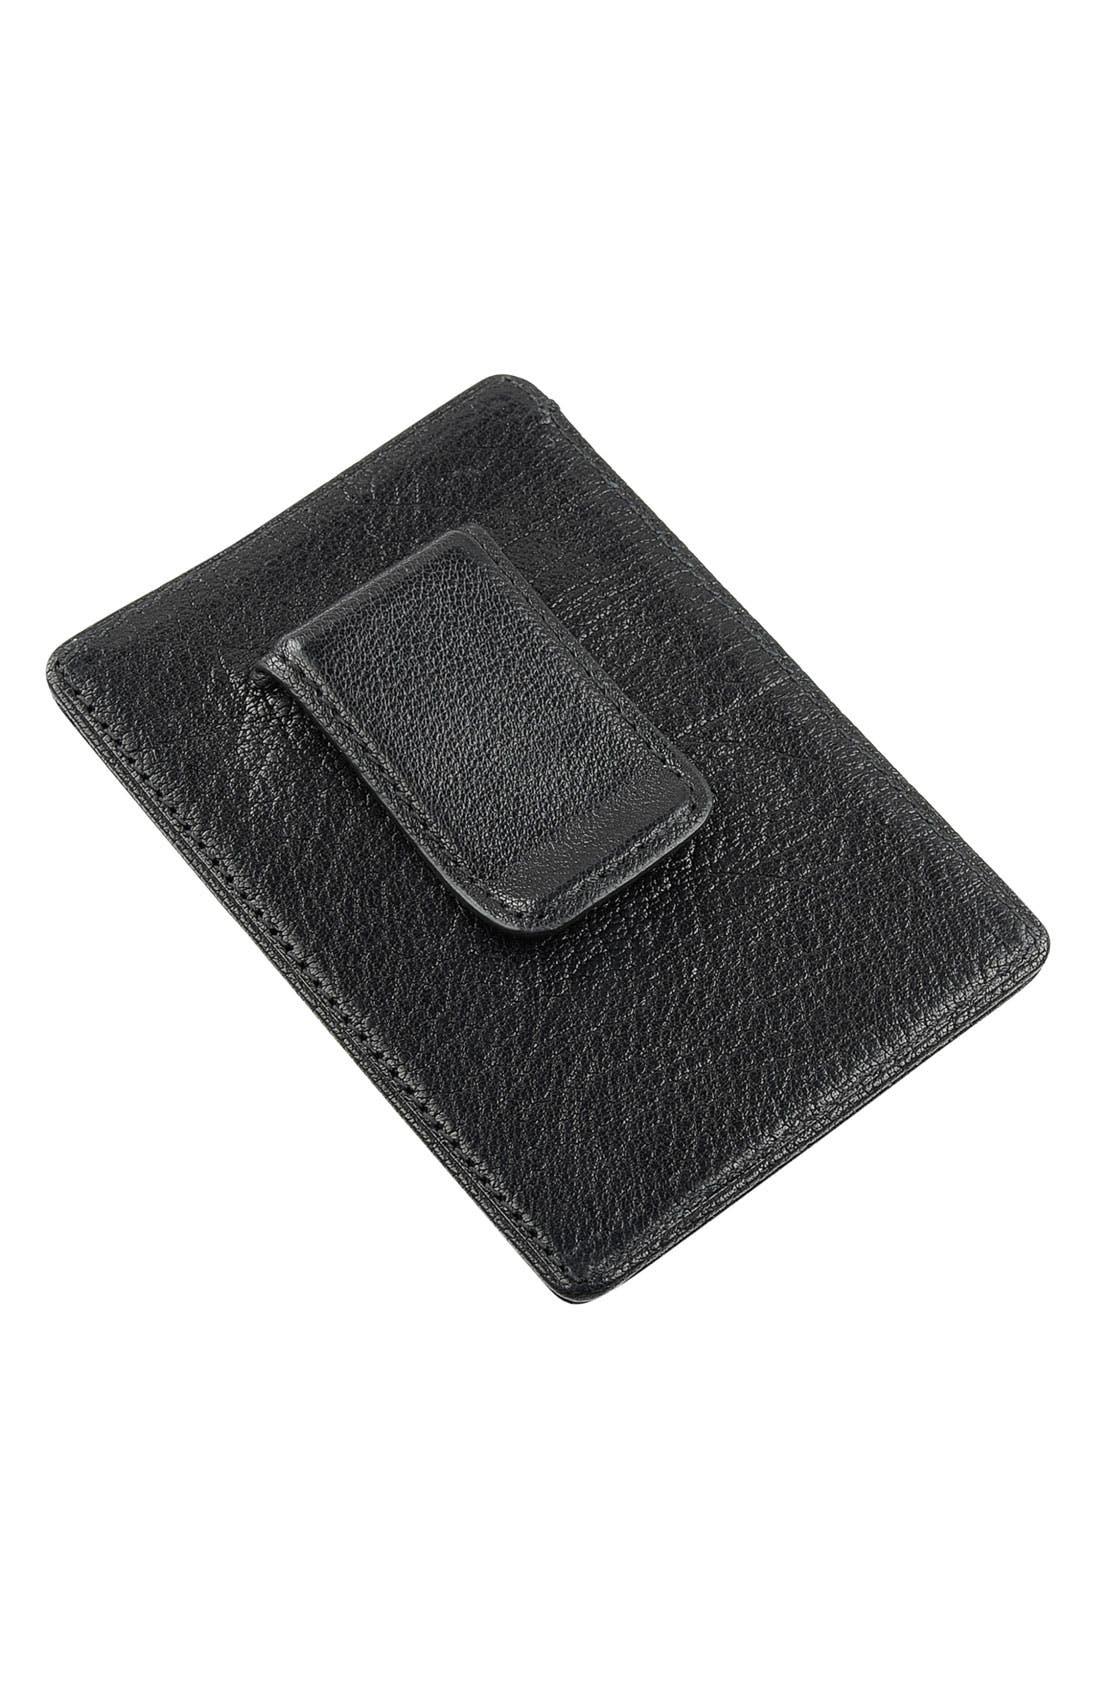 Alternate Image 3  - Tumi 'Sierra' Money Clip Card Case